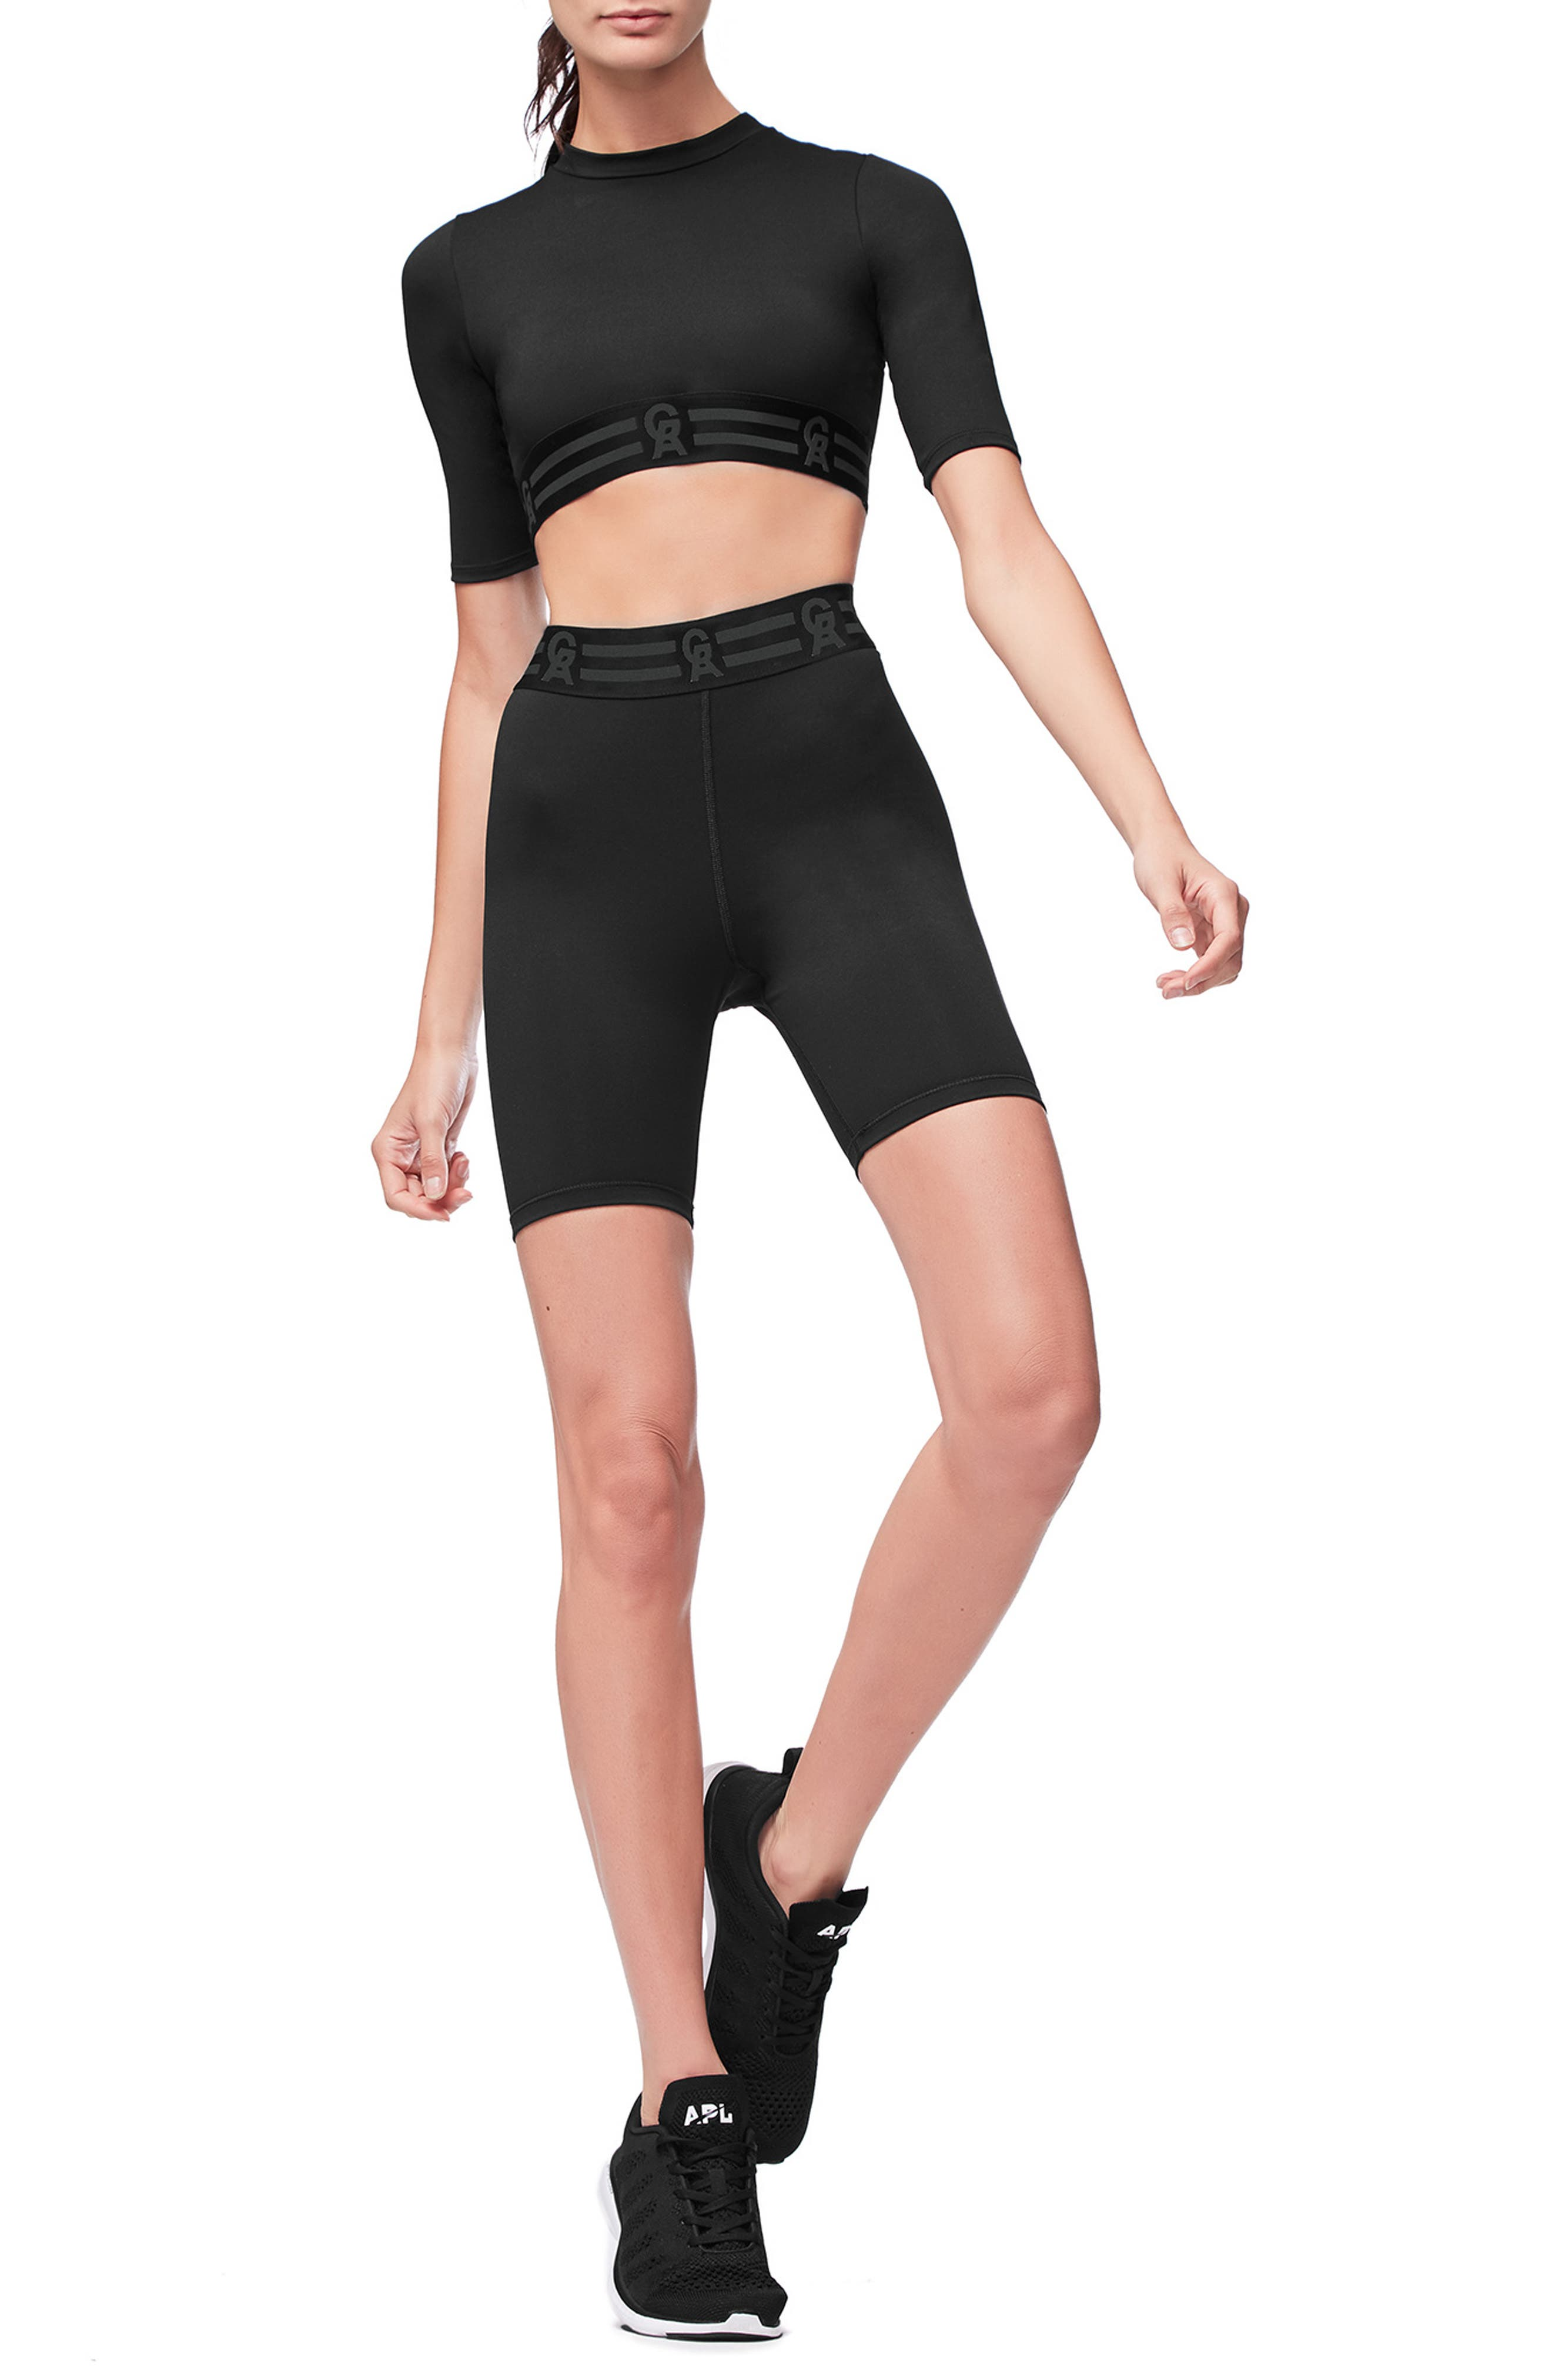 Icon High Waist Biker Shorts,                             Alternate thumbnail 7, color,                             BLACK001